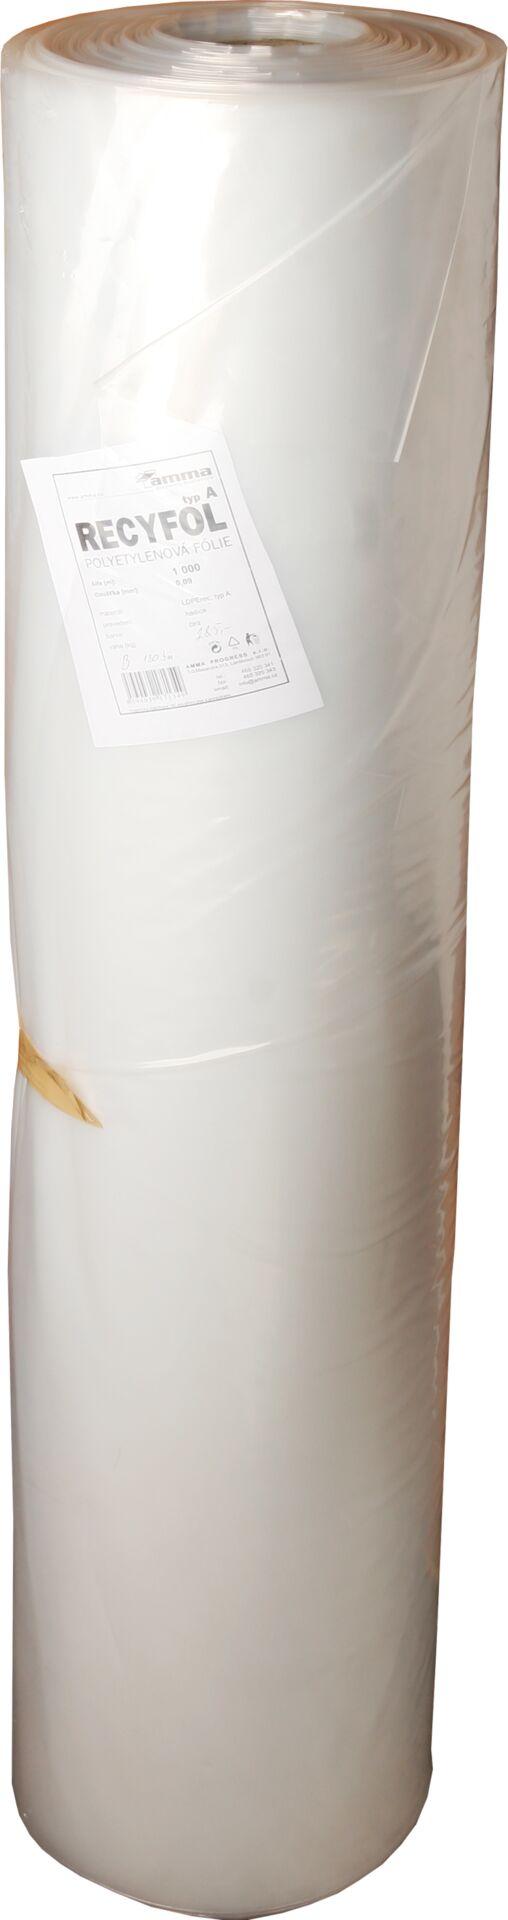 Folie hadice 1 m 0,09 - čirá (hmotnost brutto) - 30 kg